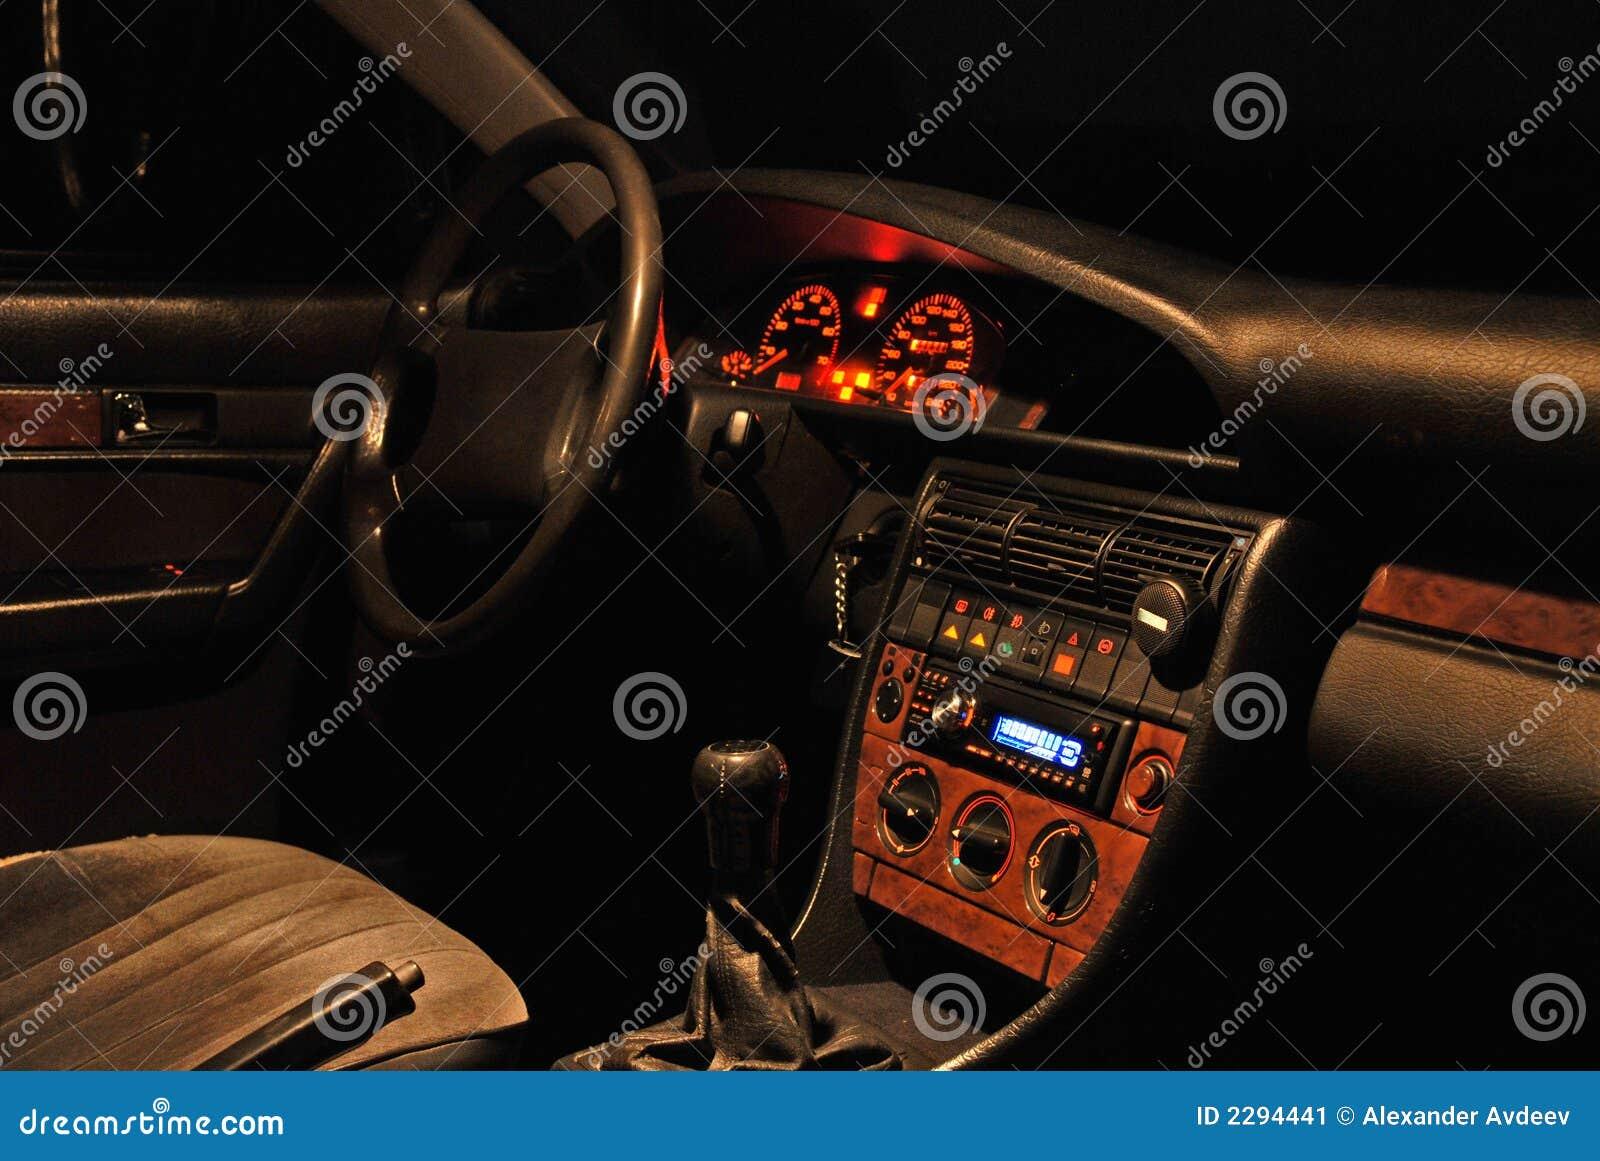 car interior at the night stock image image 2294441. Black Bedroom Furniture Sets. Home Design Ideas